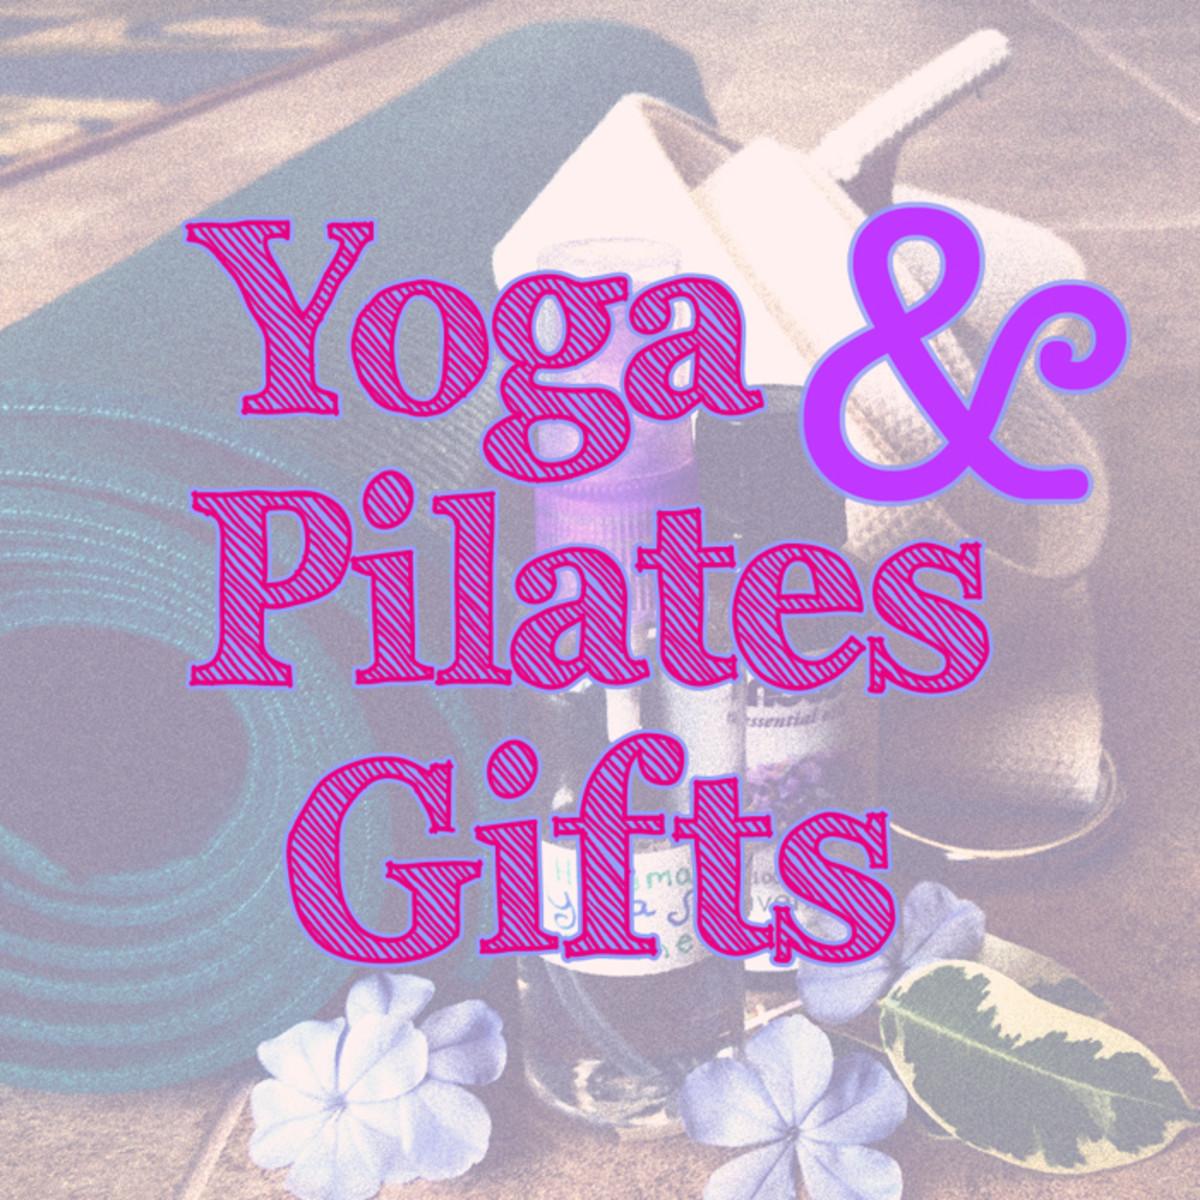 Yoga & Pilates Gifts